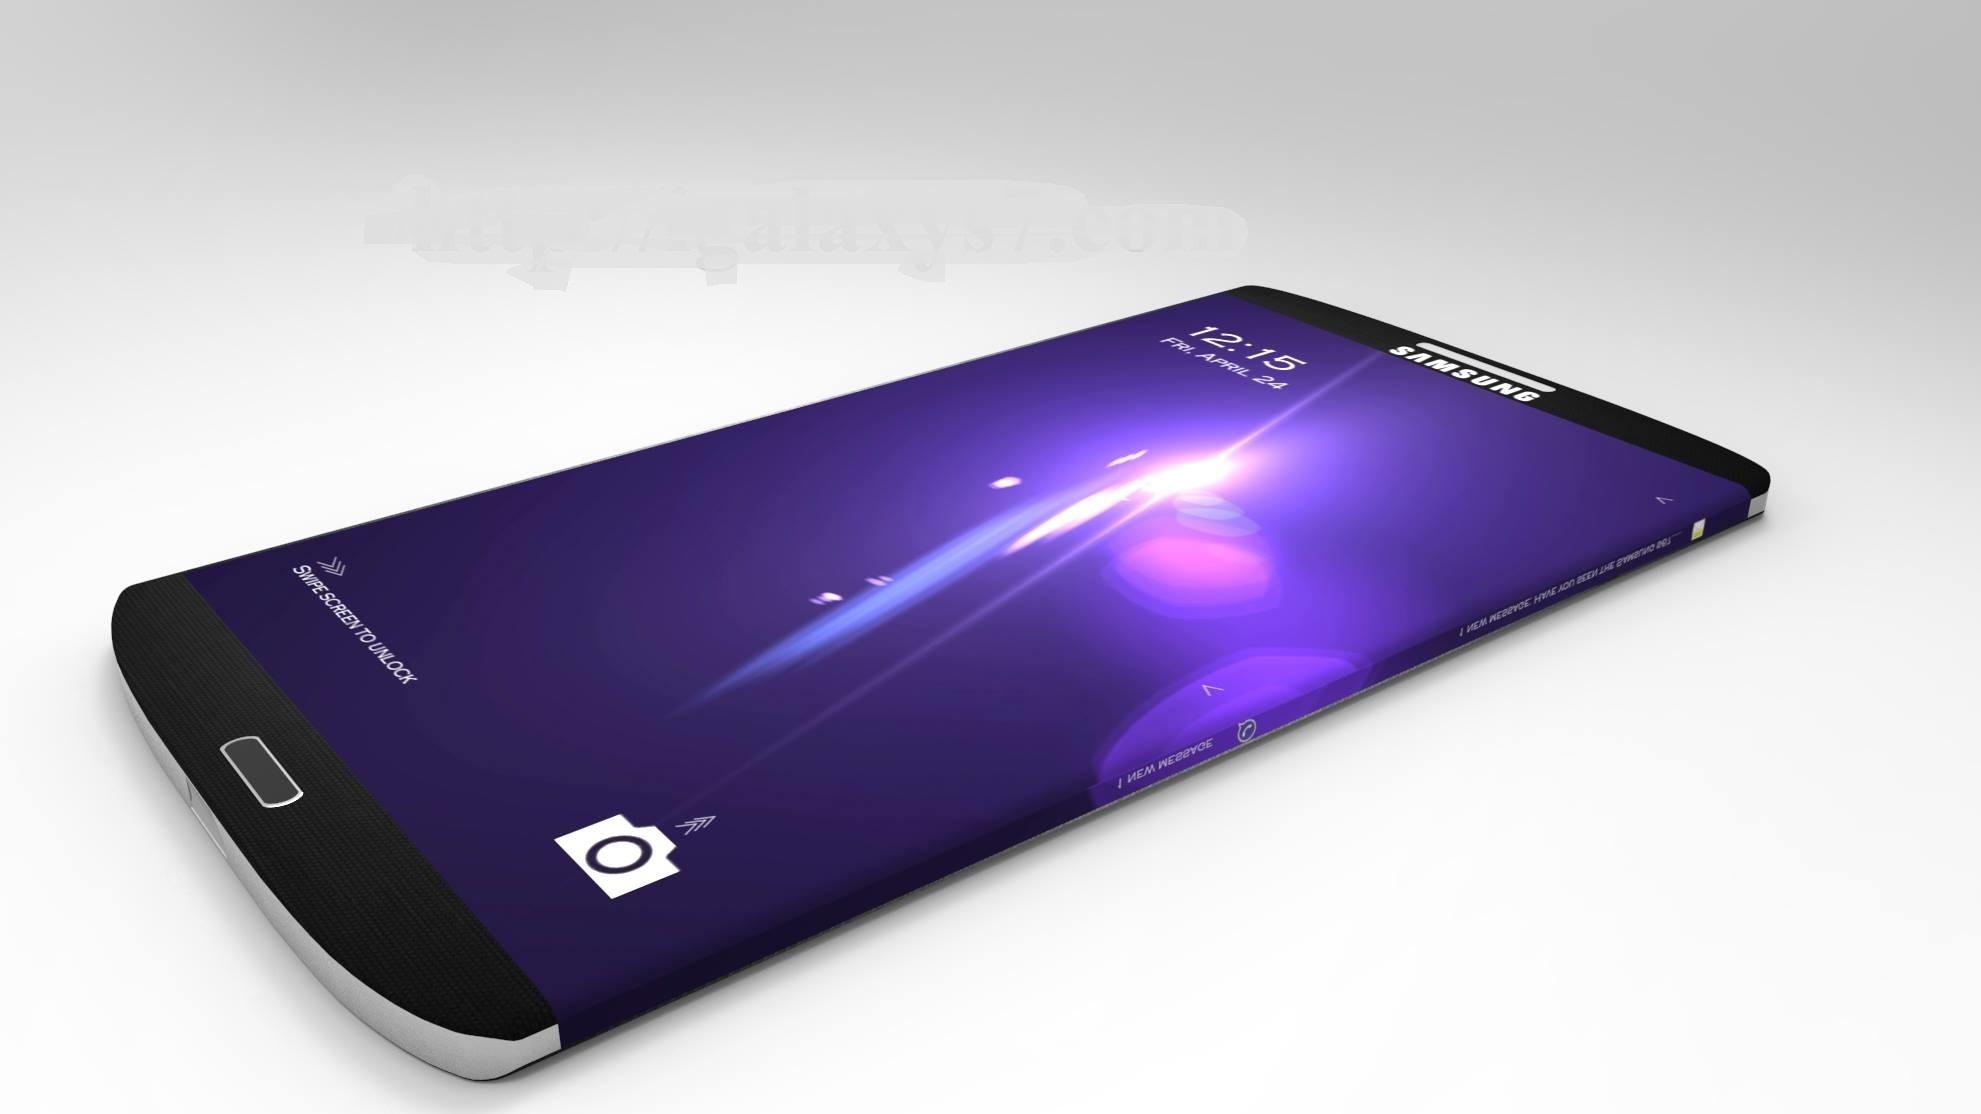 Samsung Galaxy S7 user manual